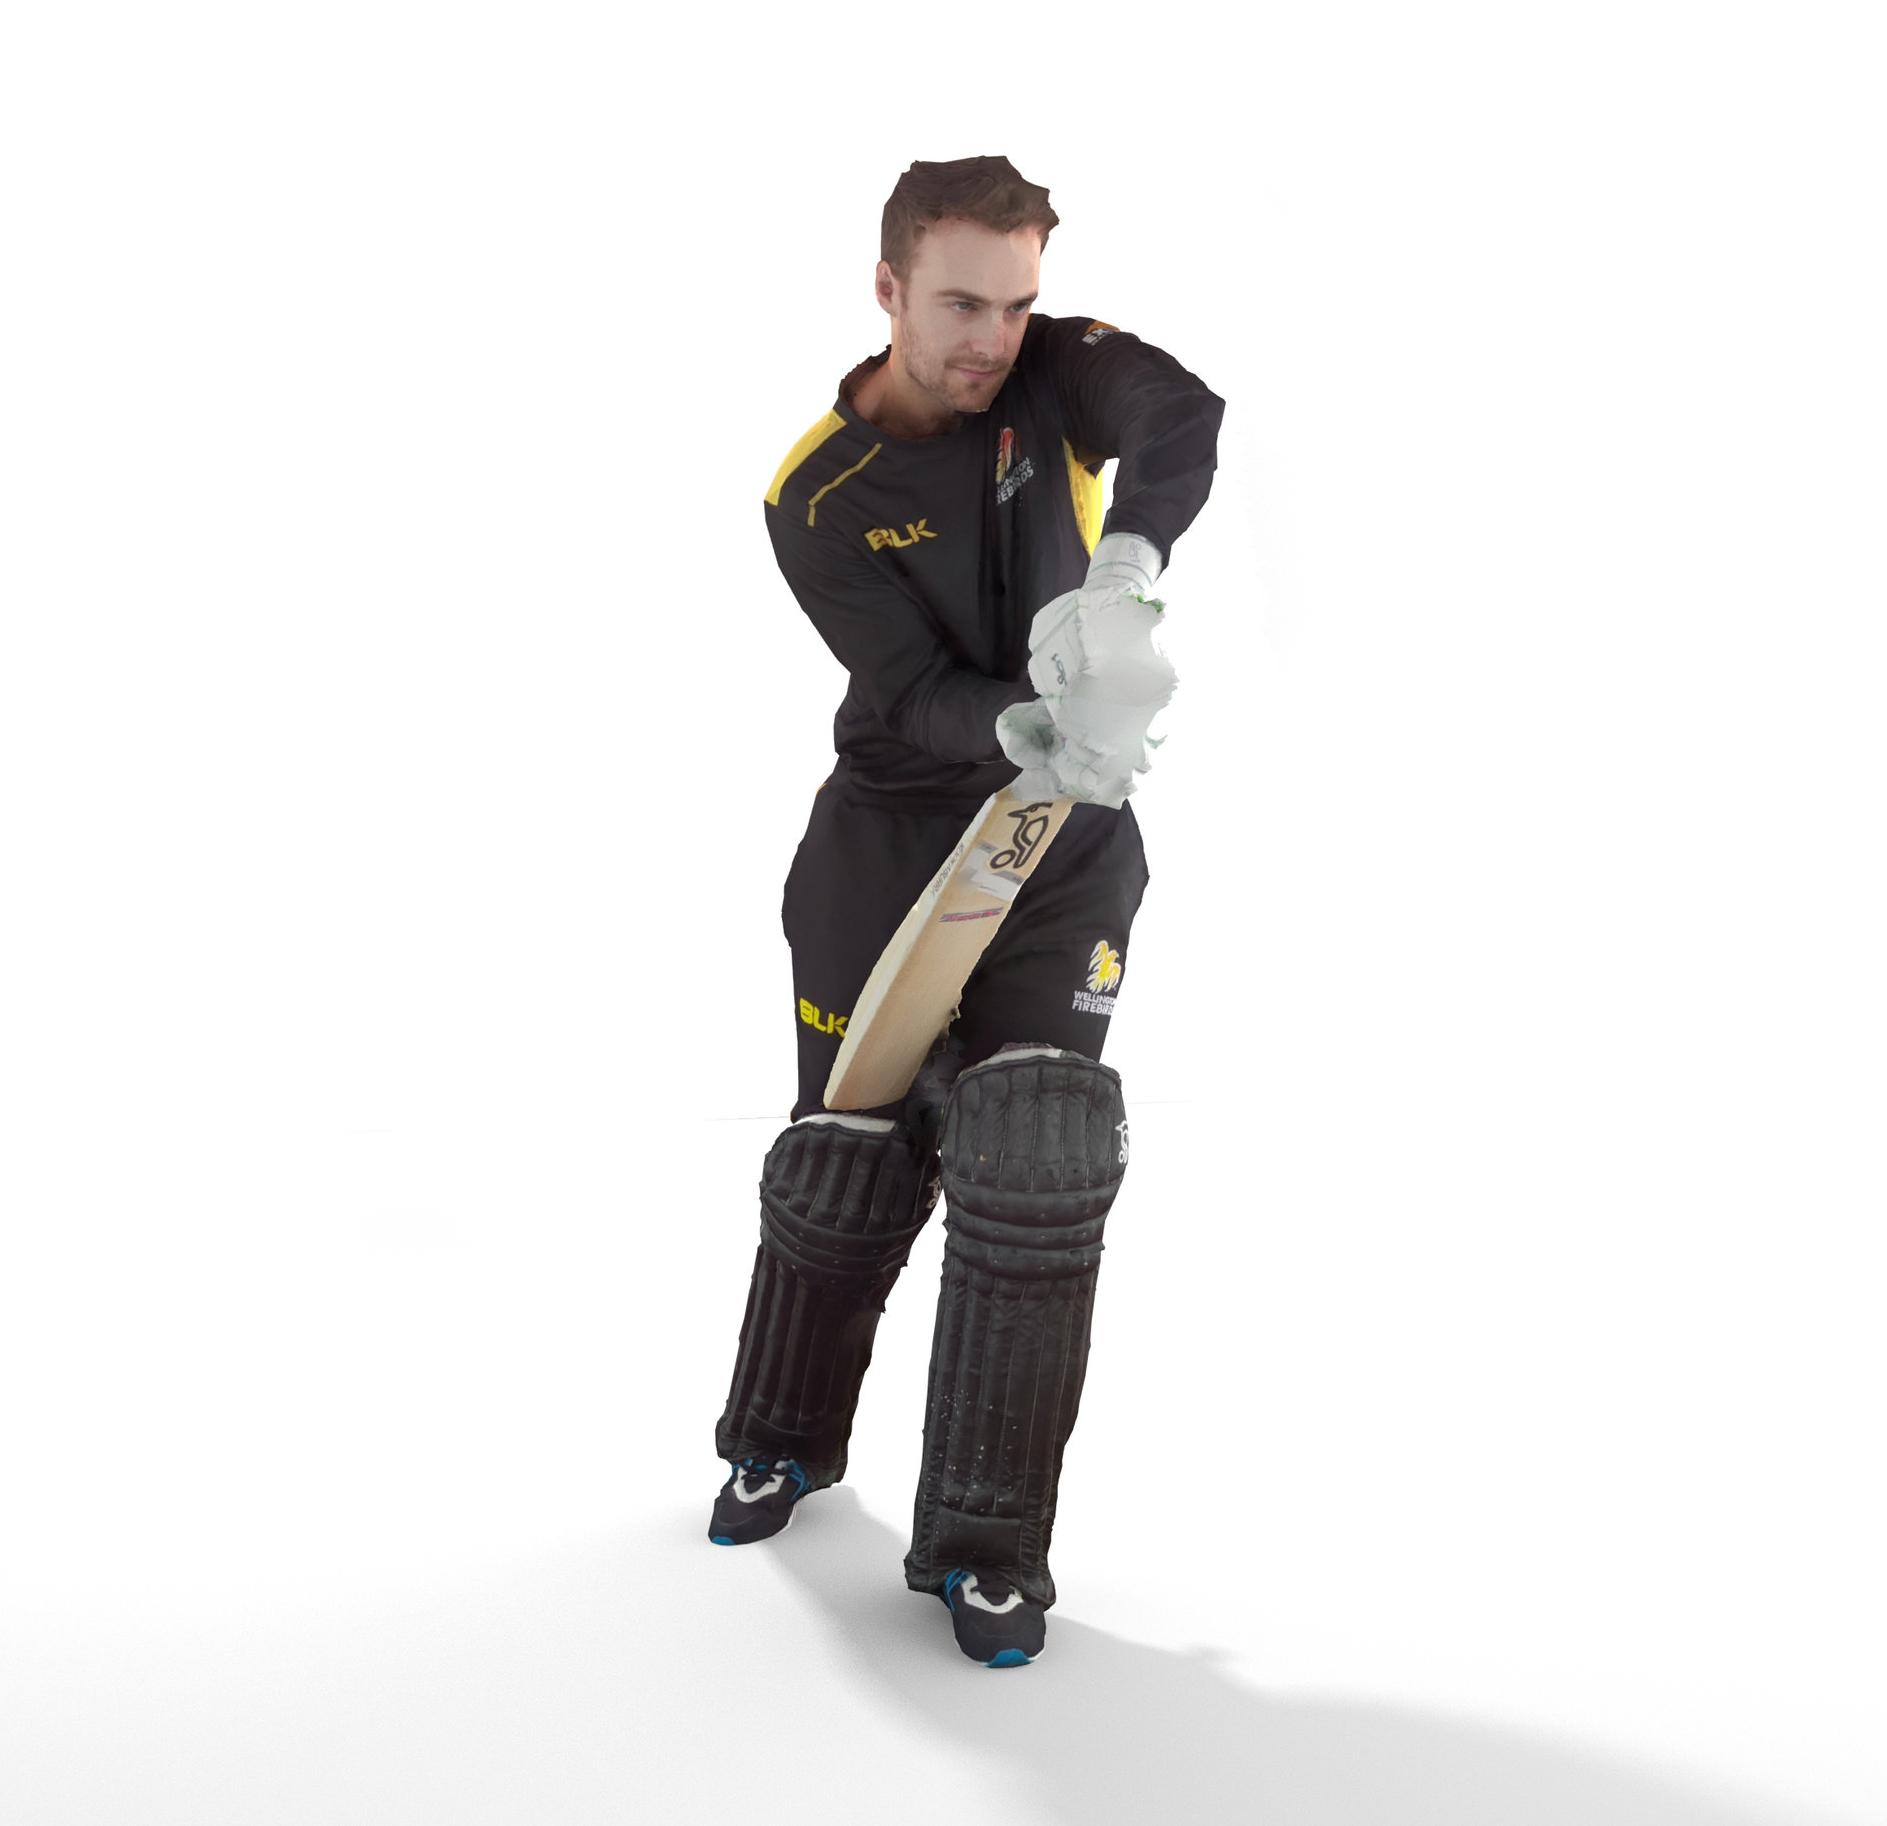 Cricketer_Render.jpg